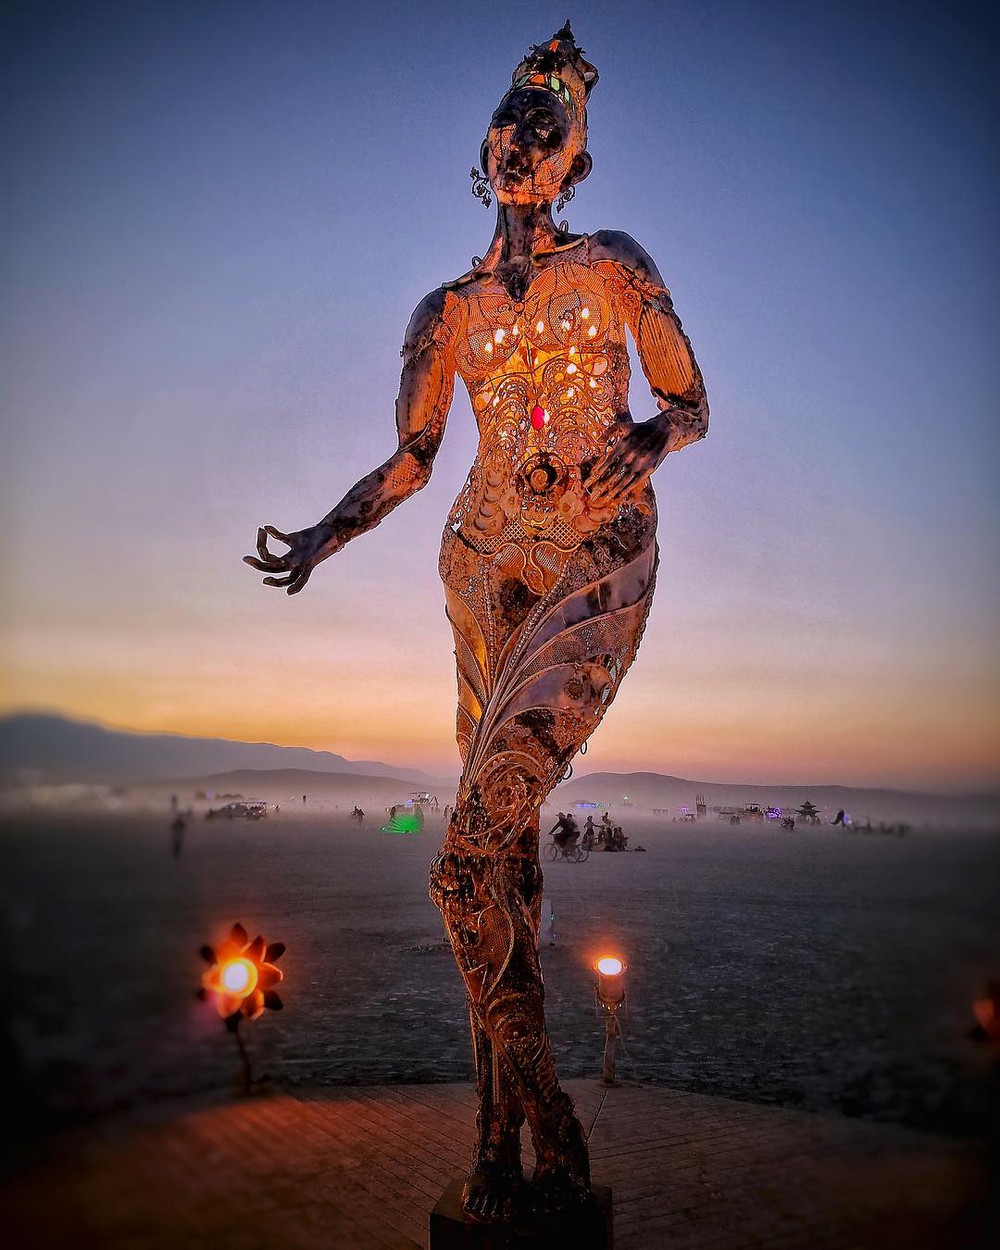 fotografii-festivalya-Burning-Man-2018_6